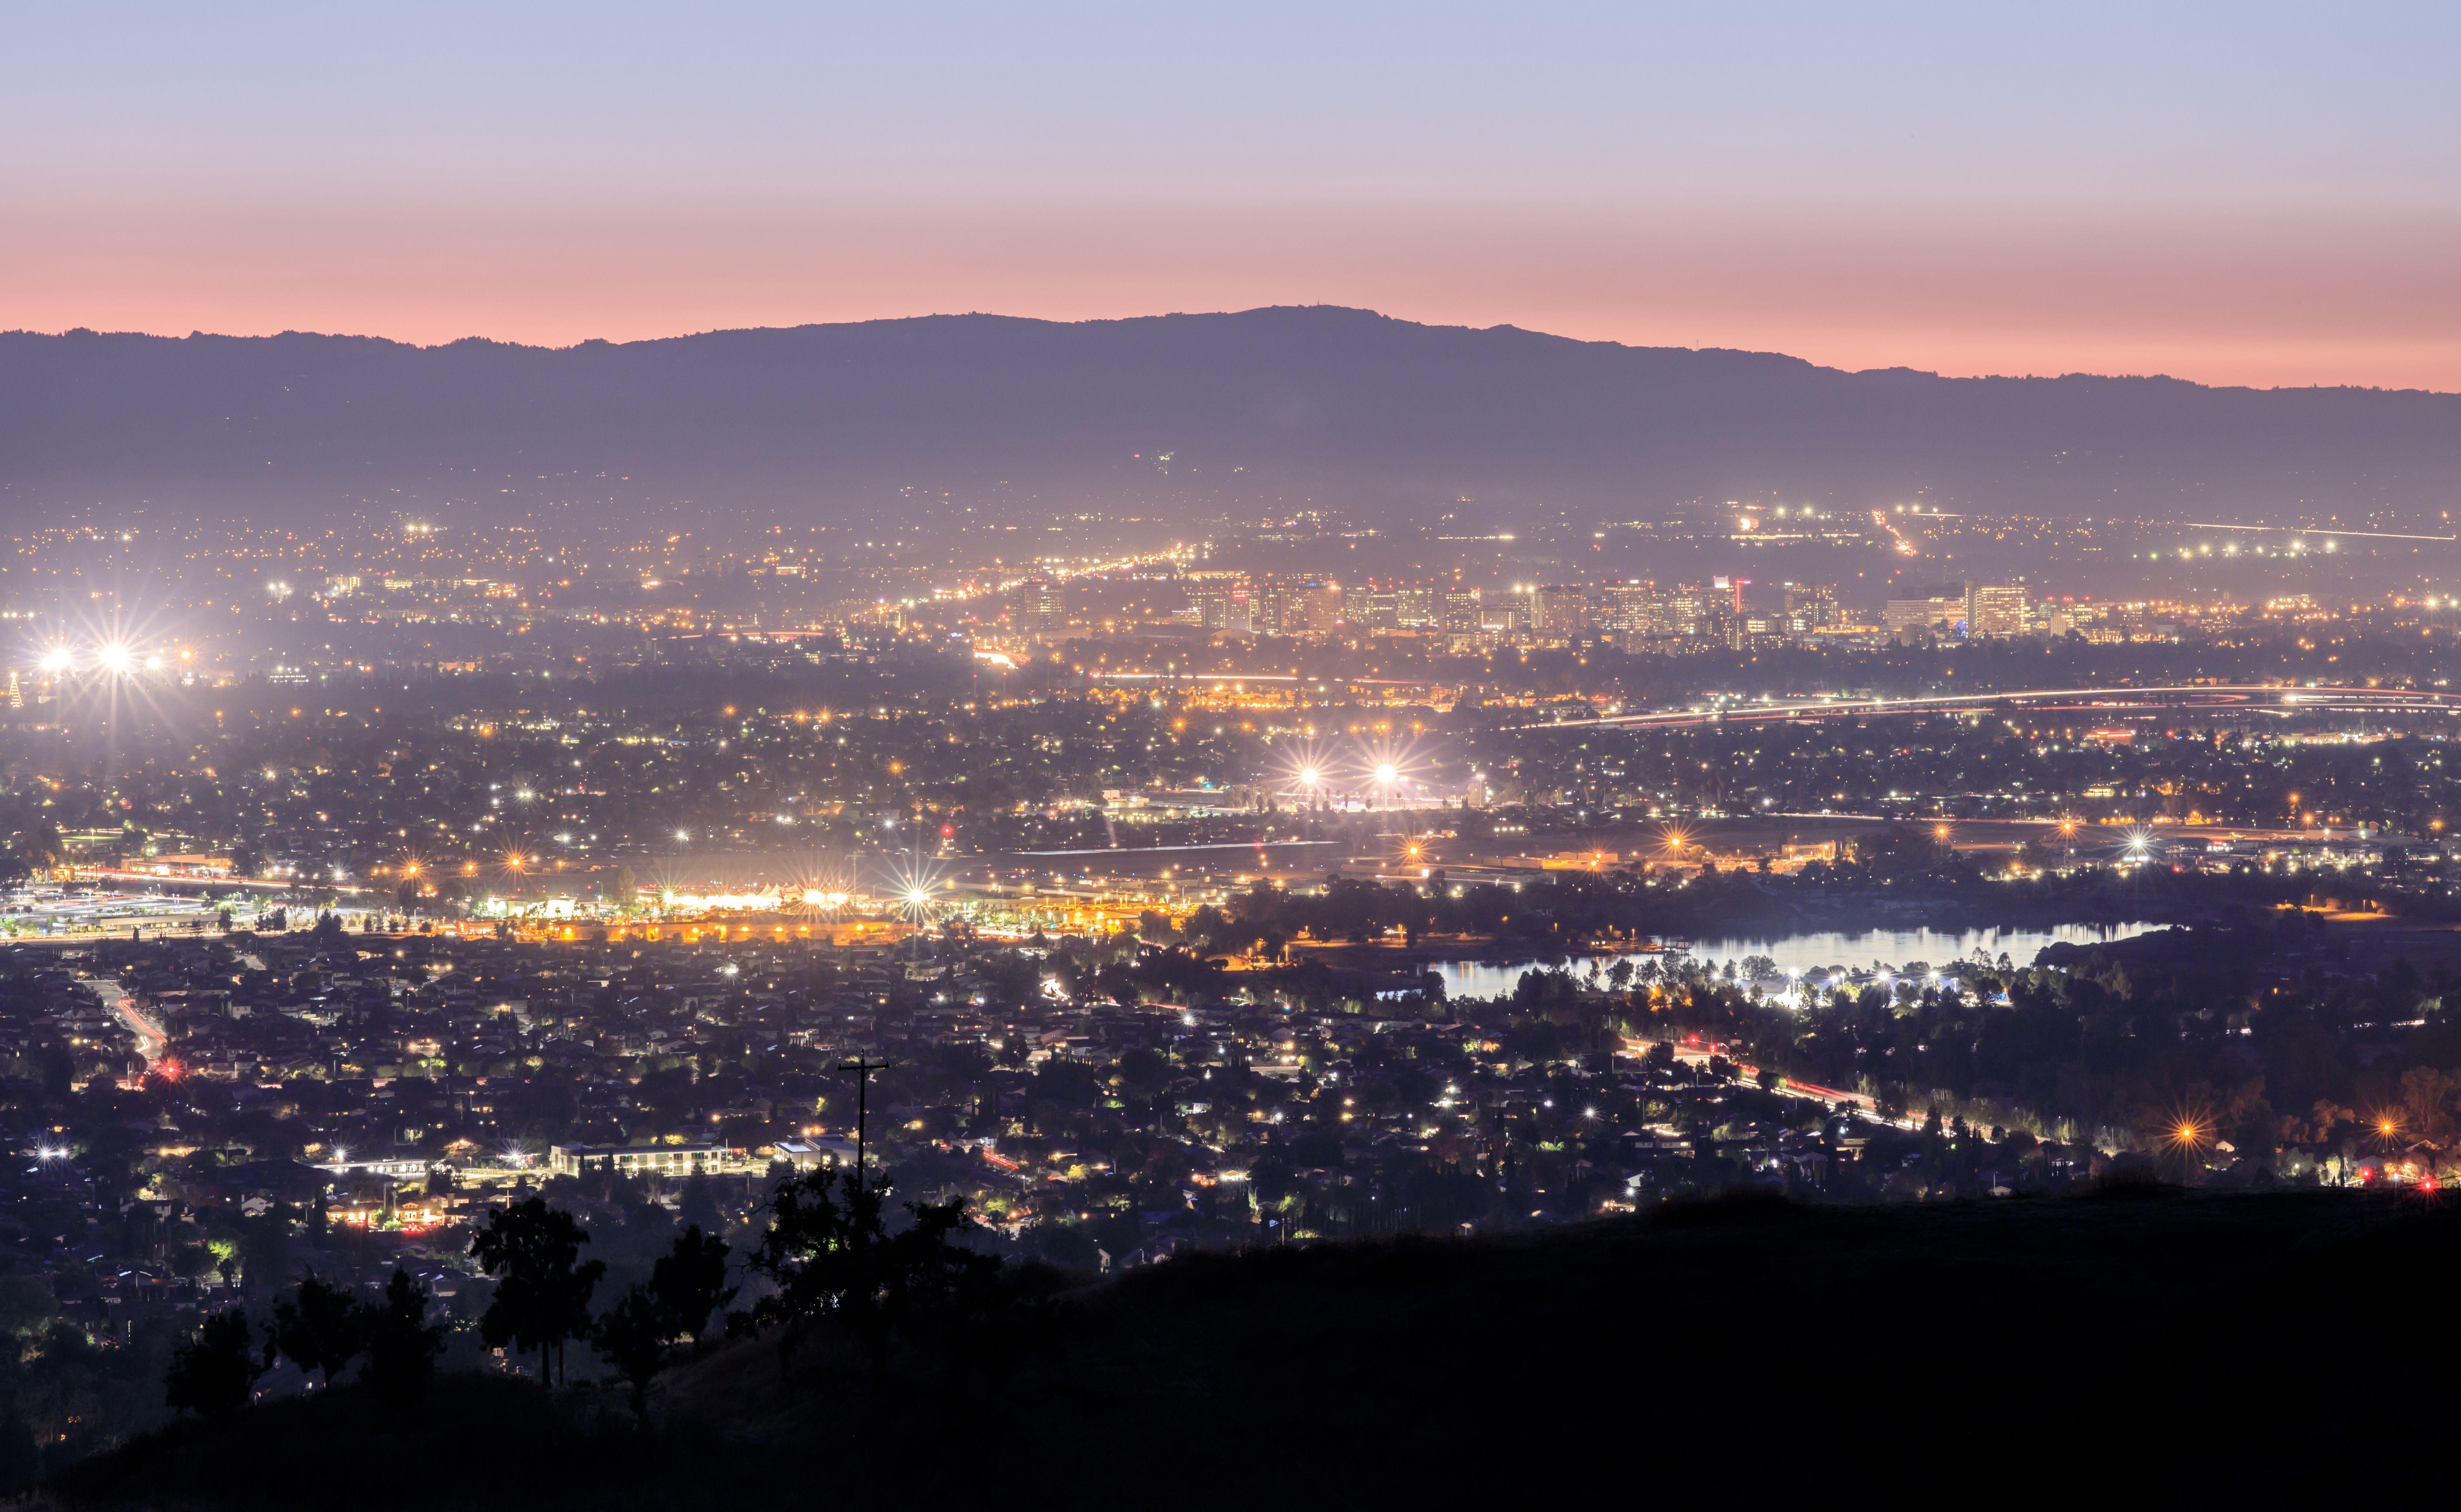 Sunnyvale/Santa Clara 2018 ERI Report